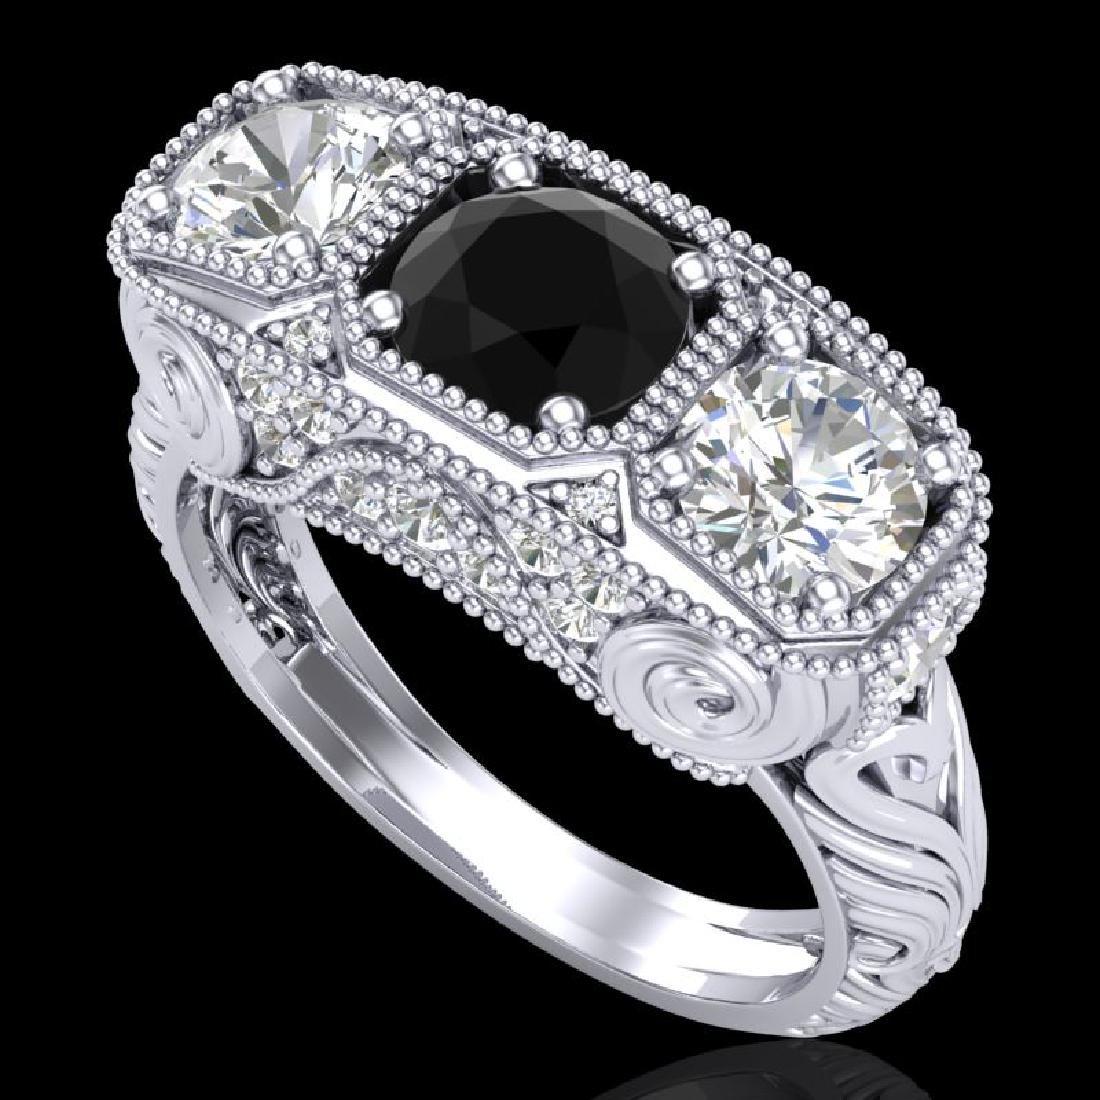 2.51 CTW Fancy Black Diamond Solitaire Art Deco 3 Stone